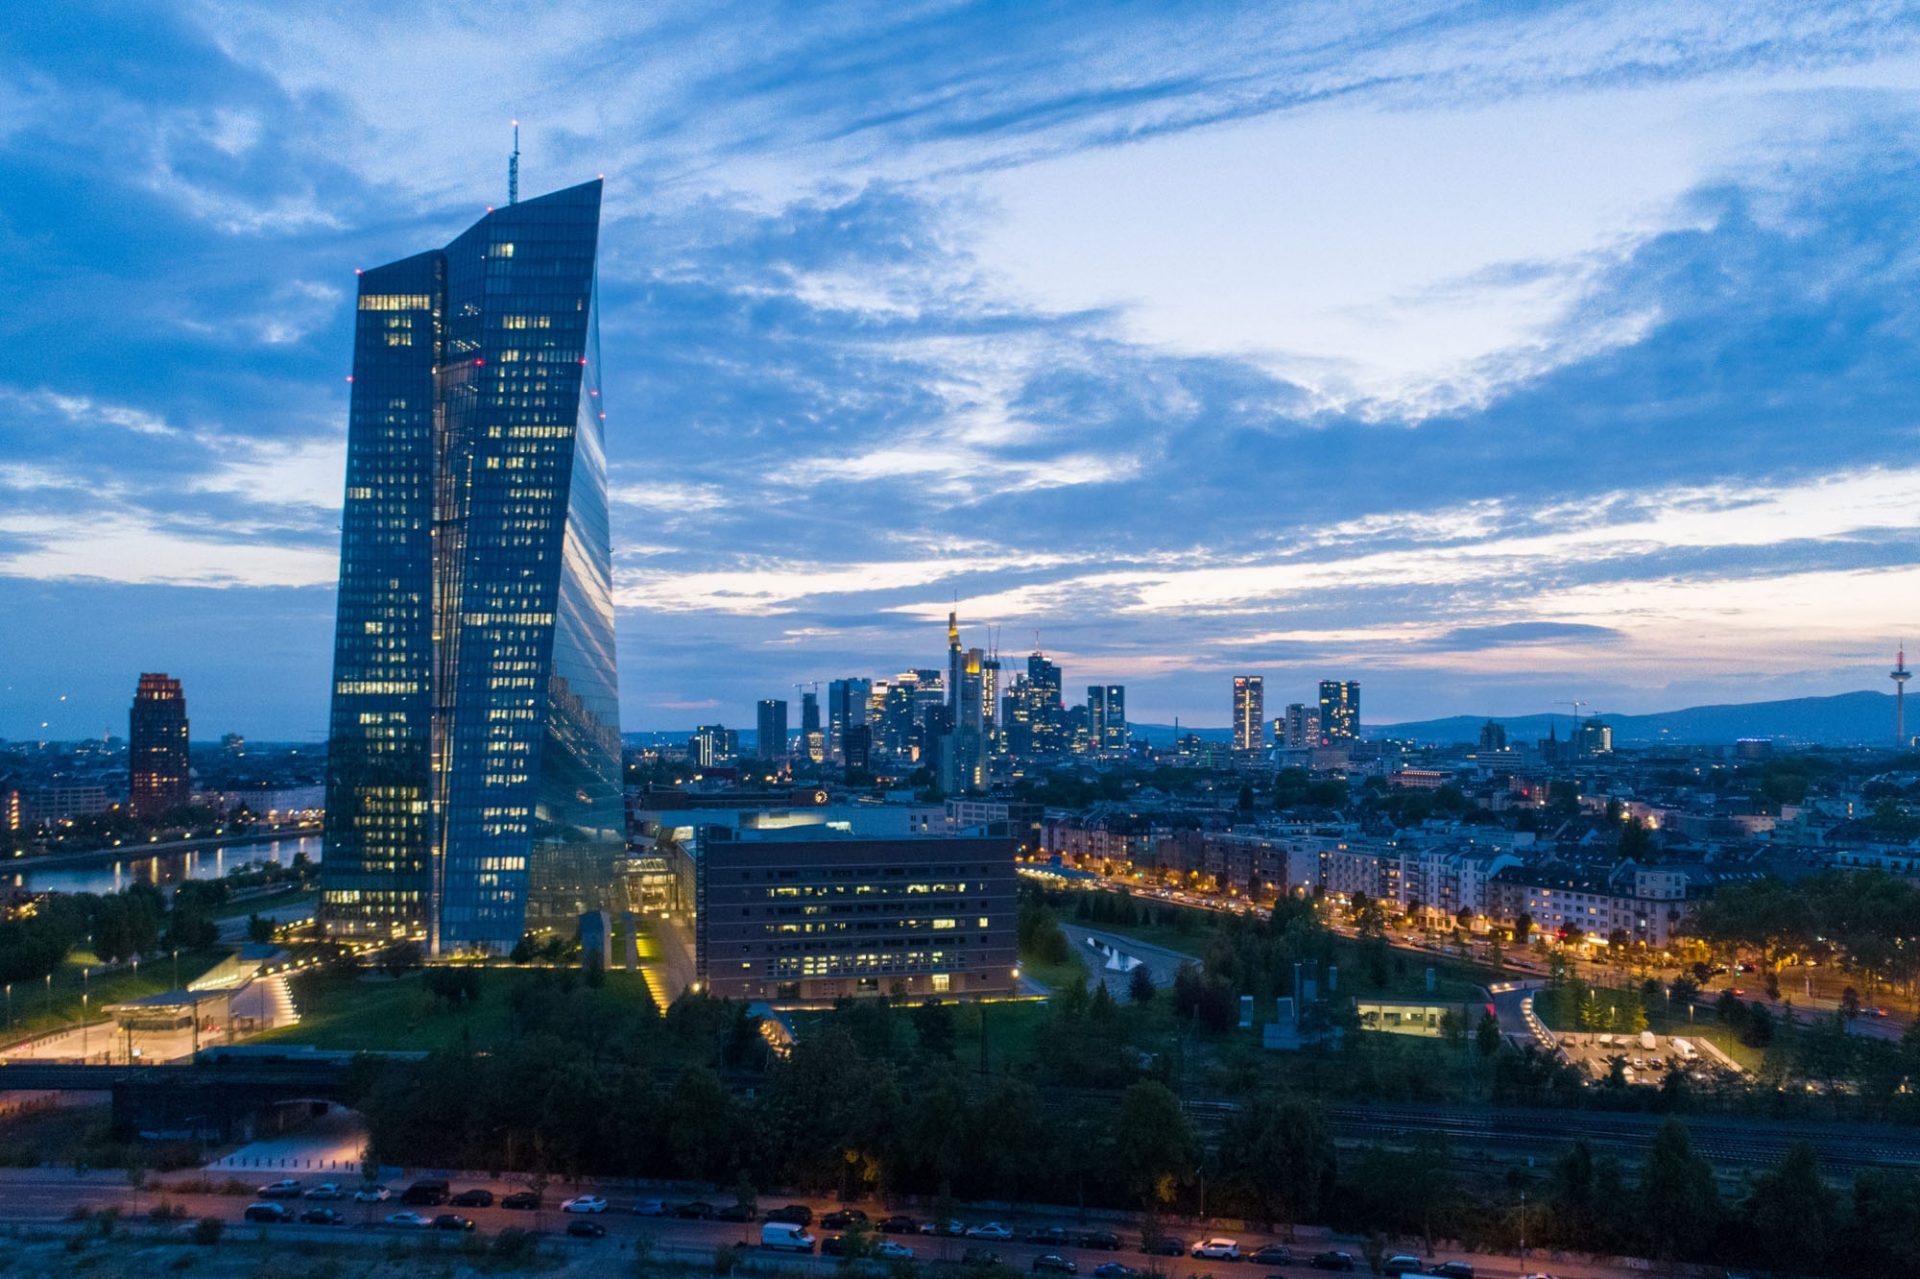 Drohnenfotograf in Frankfurt © Offenblende / Christian CHSO